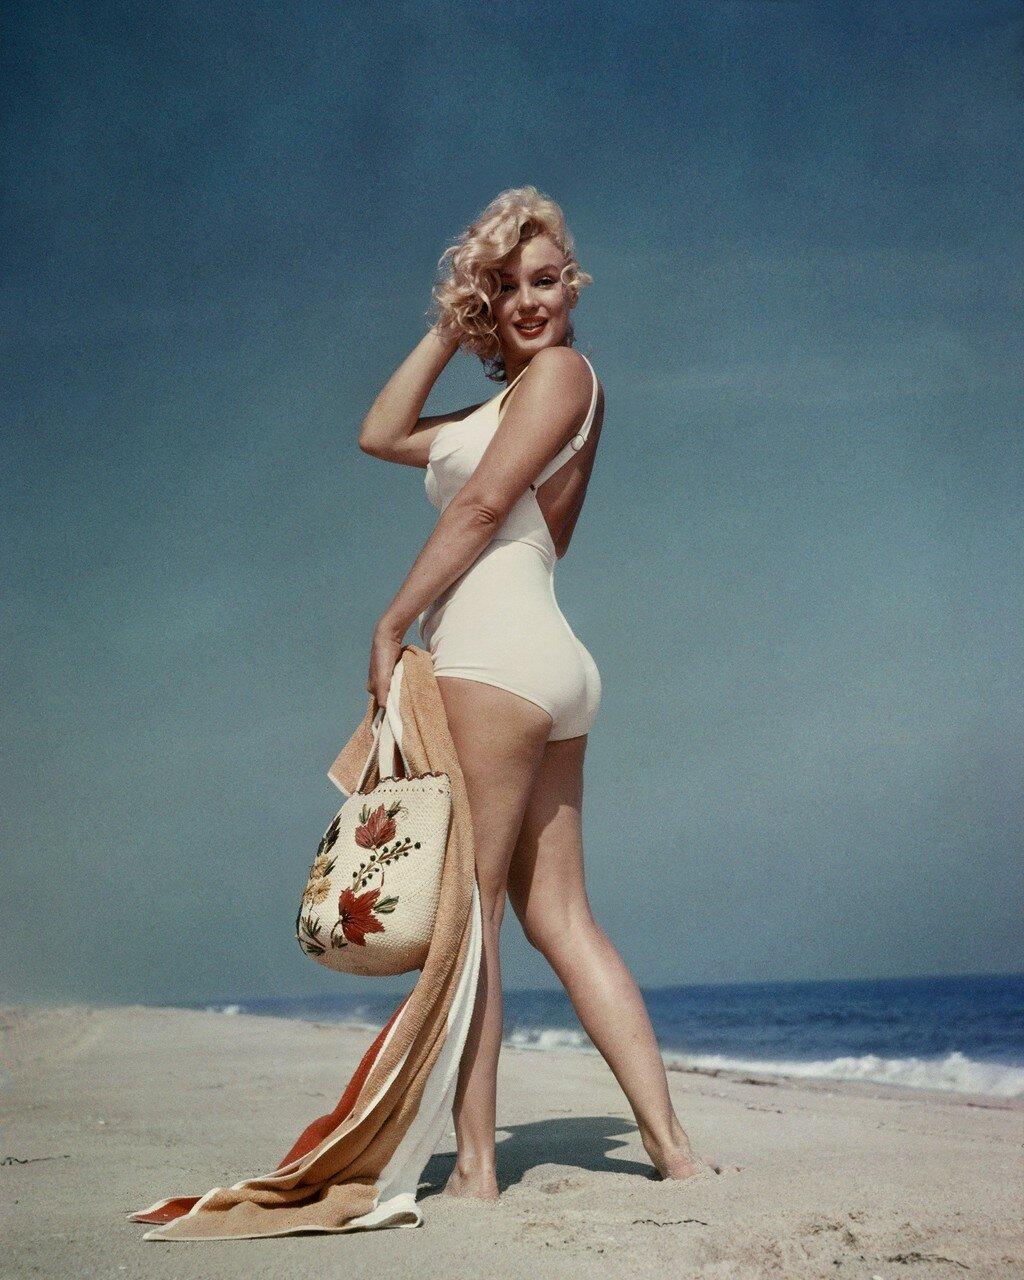 MARILYN MONROE, AMAGANSETT BEACH, LONG ISLAND, NEW YORK, AMERICA - 1957